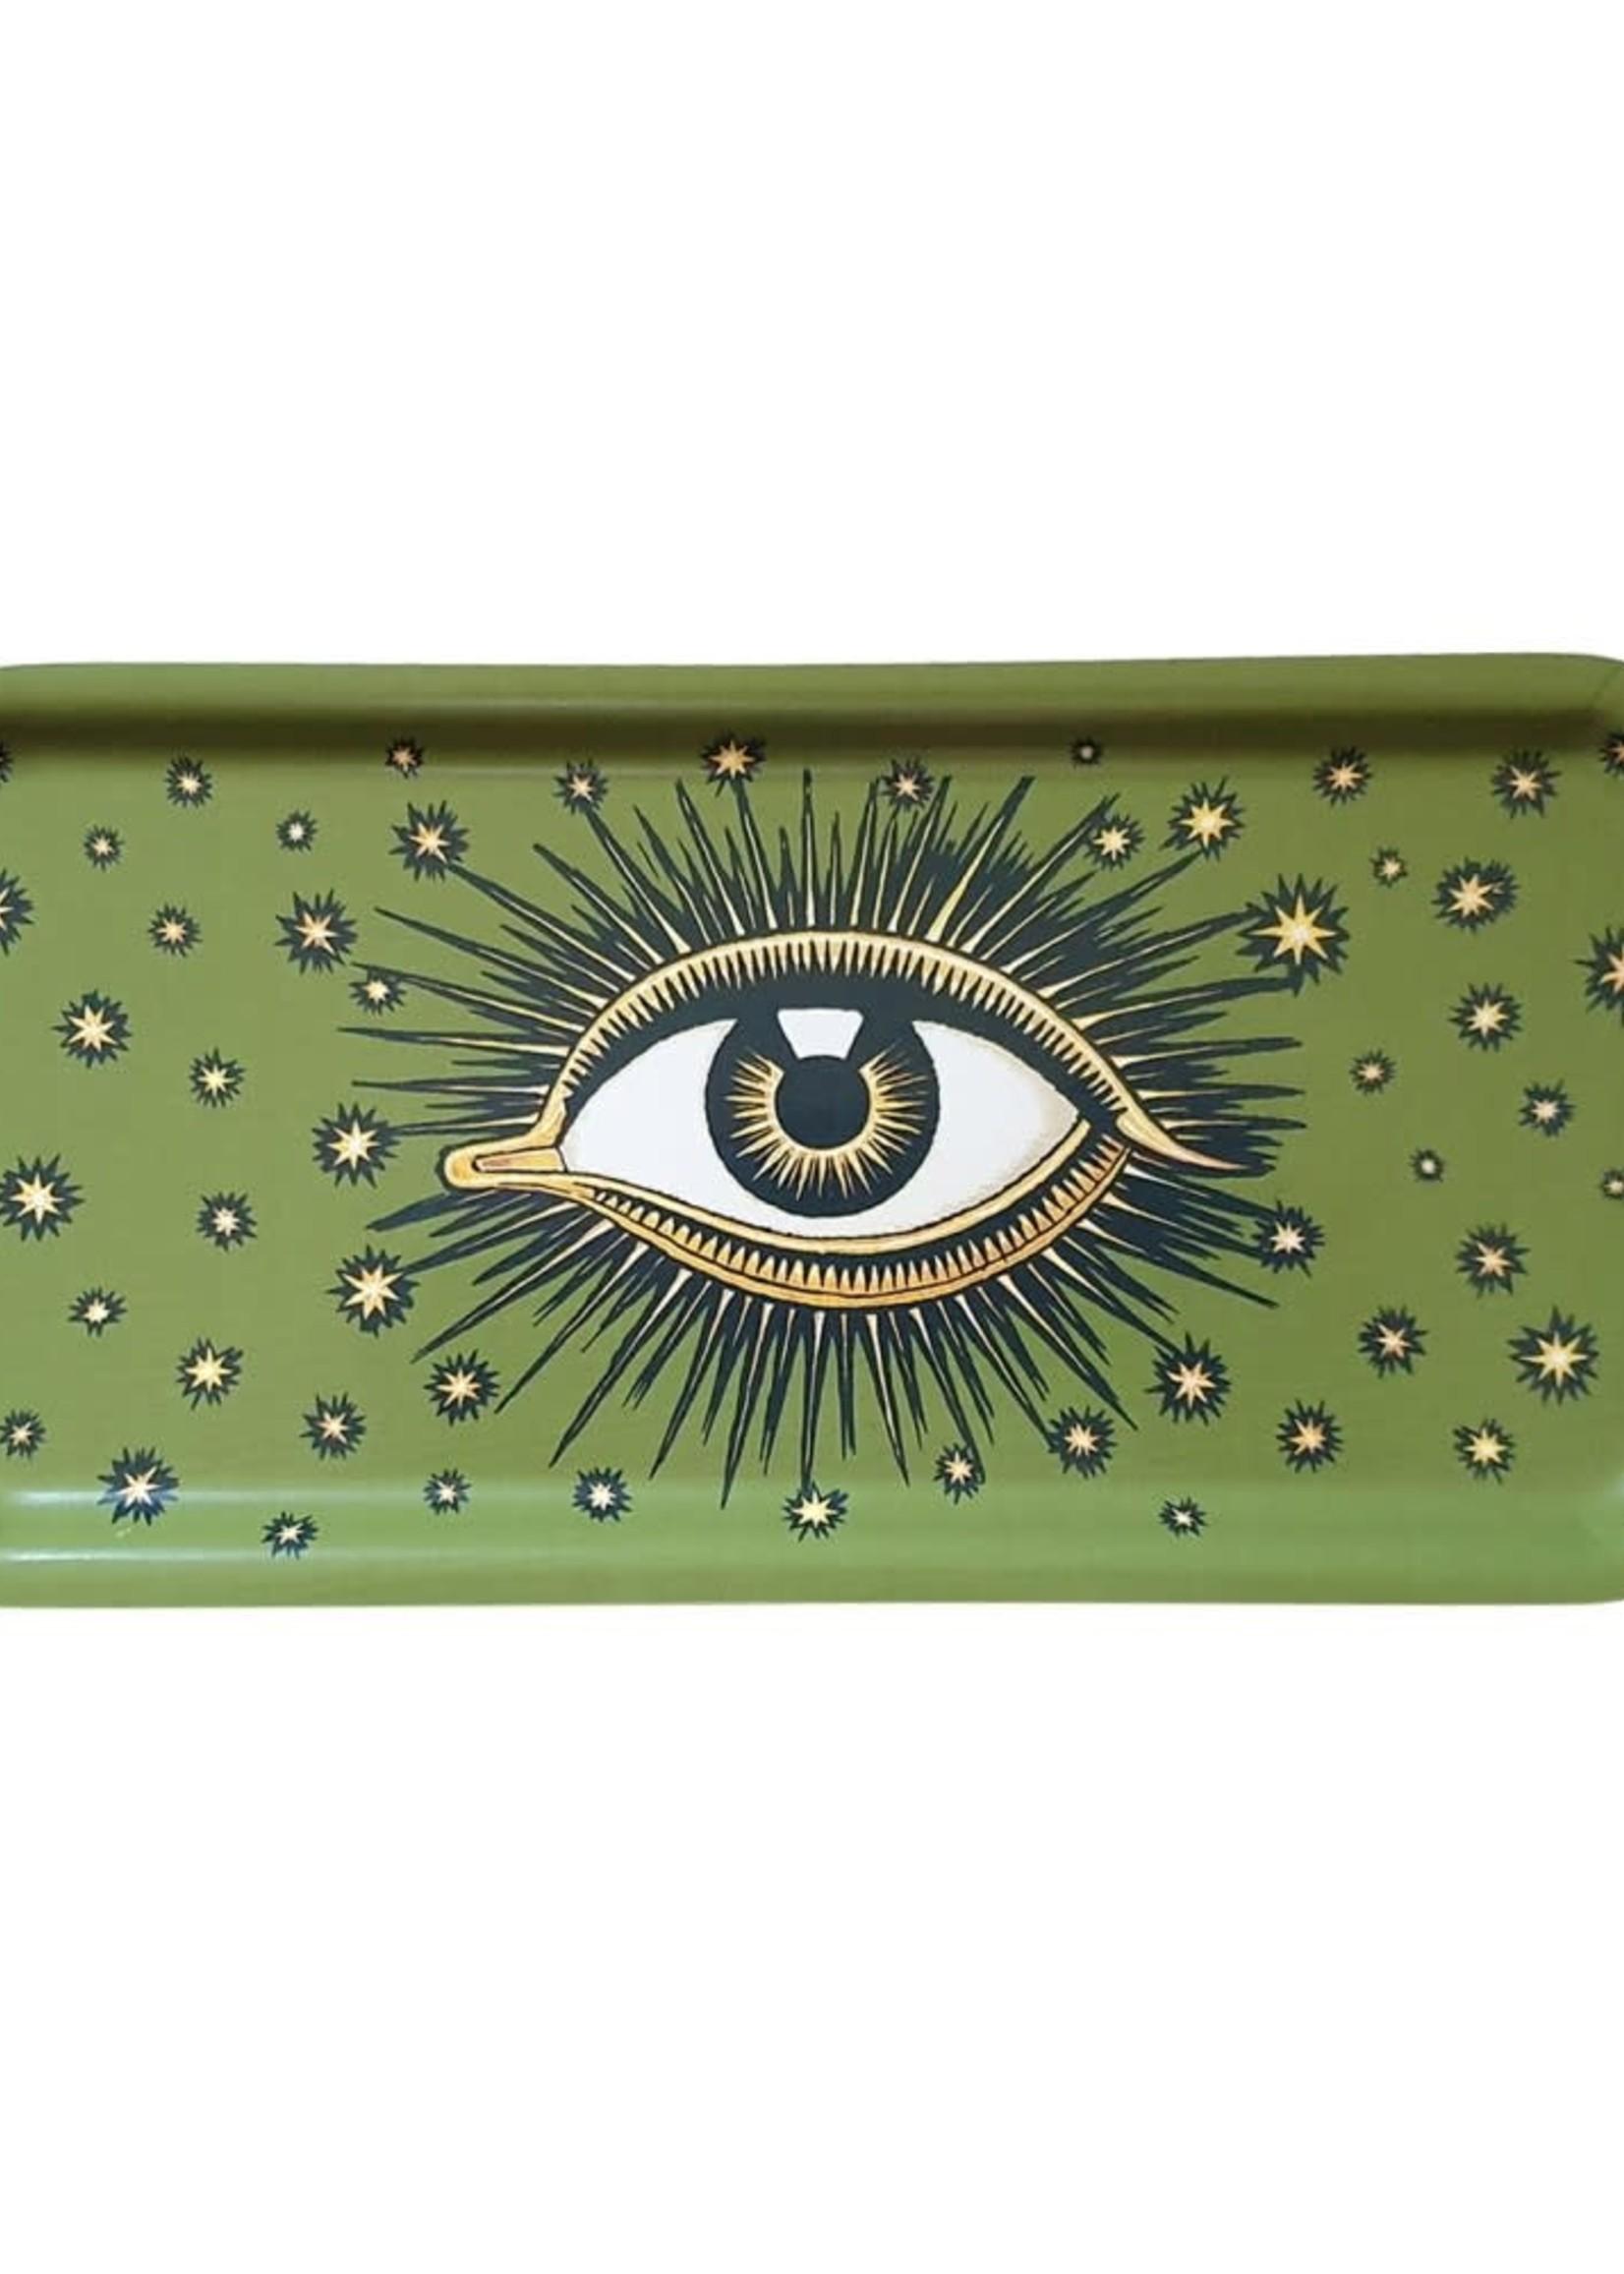 Les Ottomans Dienblad oog GROEN hout 27.5x13.5